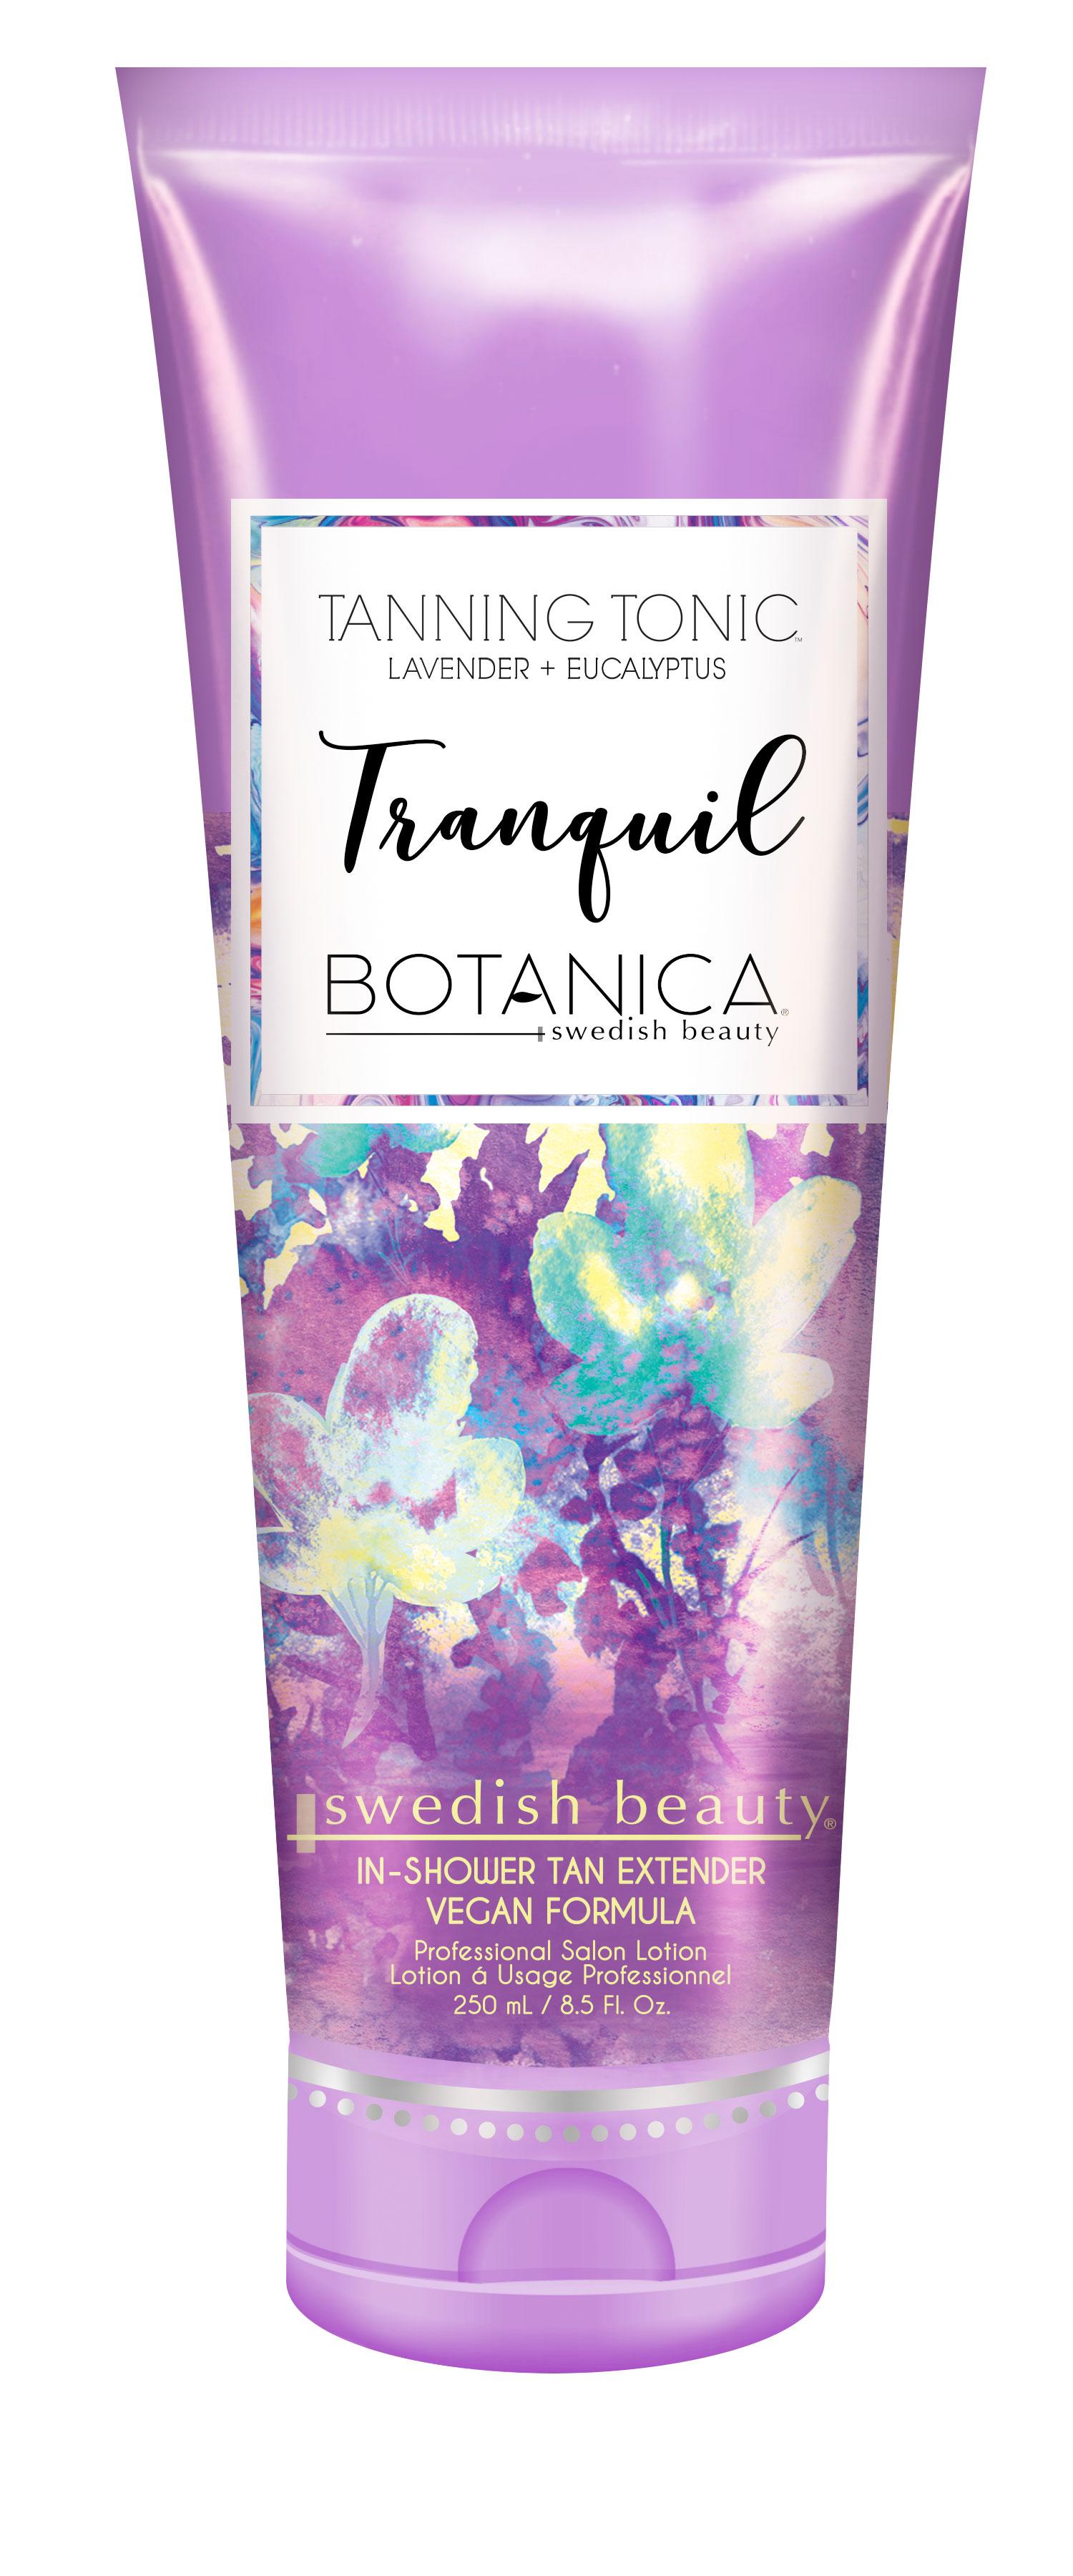 Tranquil Tanning Tonic™ Lavender + Eucalyptus In-Shower Tan Extender